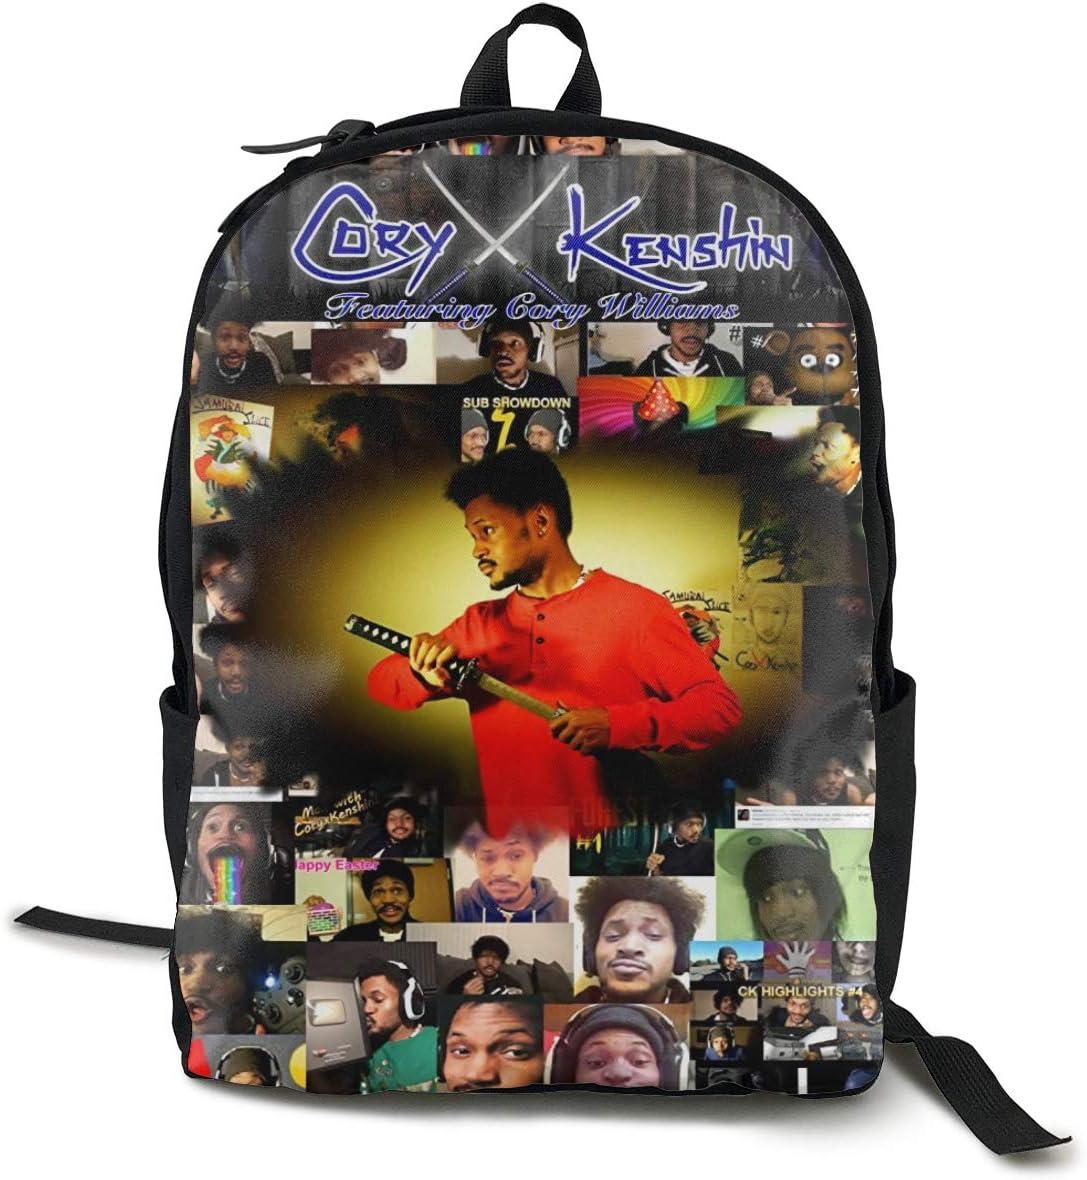 CoryxKenshin Backpacks Phoenix Mall Travel Laptop Backpack for 5 ☆ popular Me Gifts Women